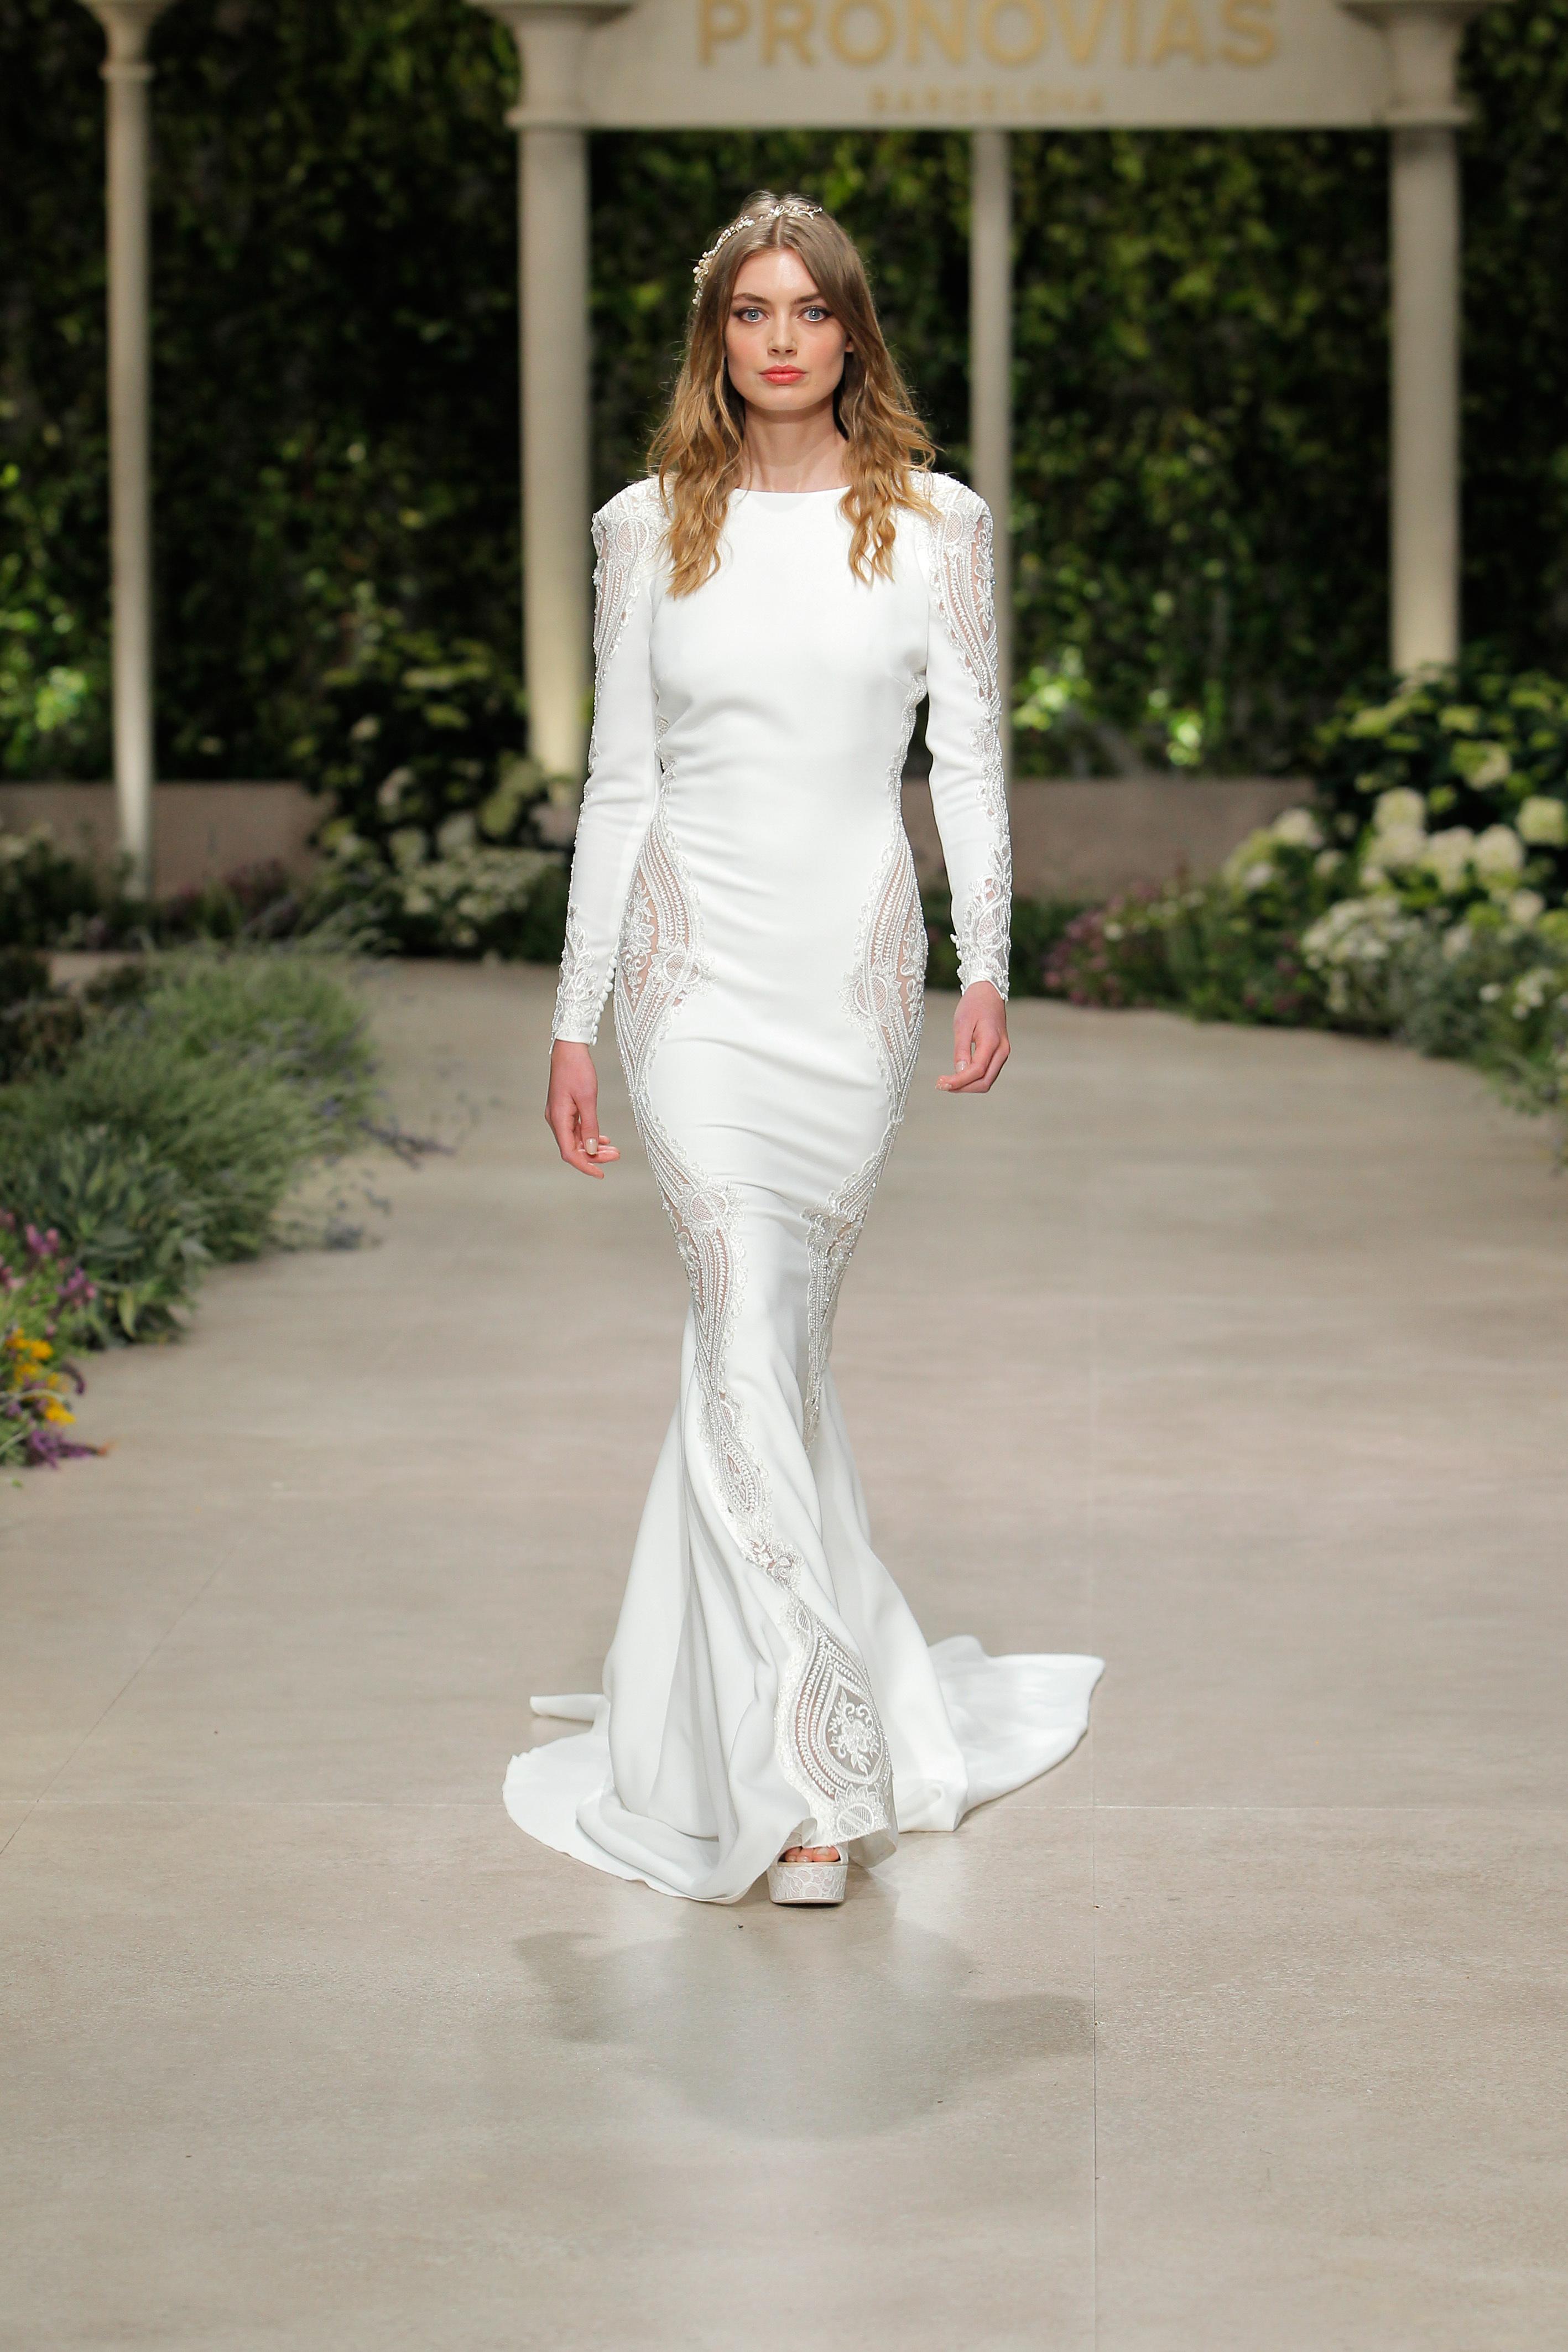 pronovias wedding dress spring 2019 long sleeve sheath